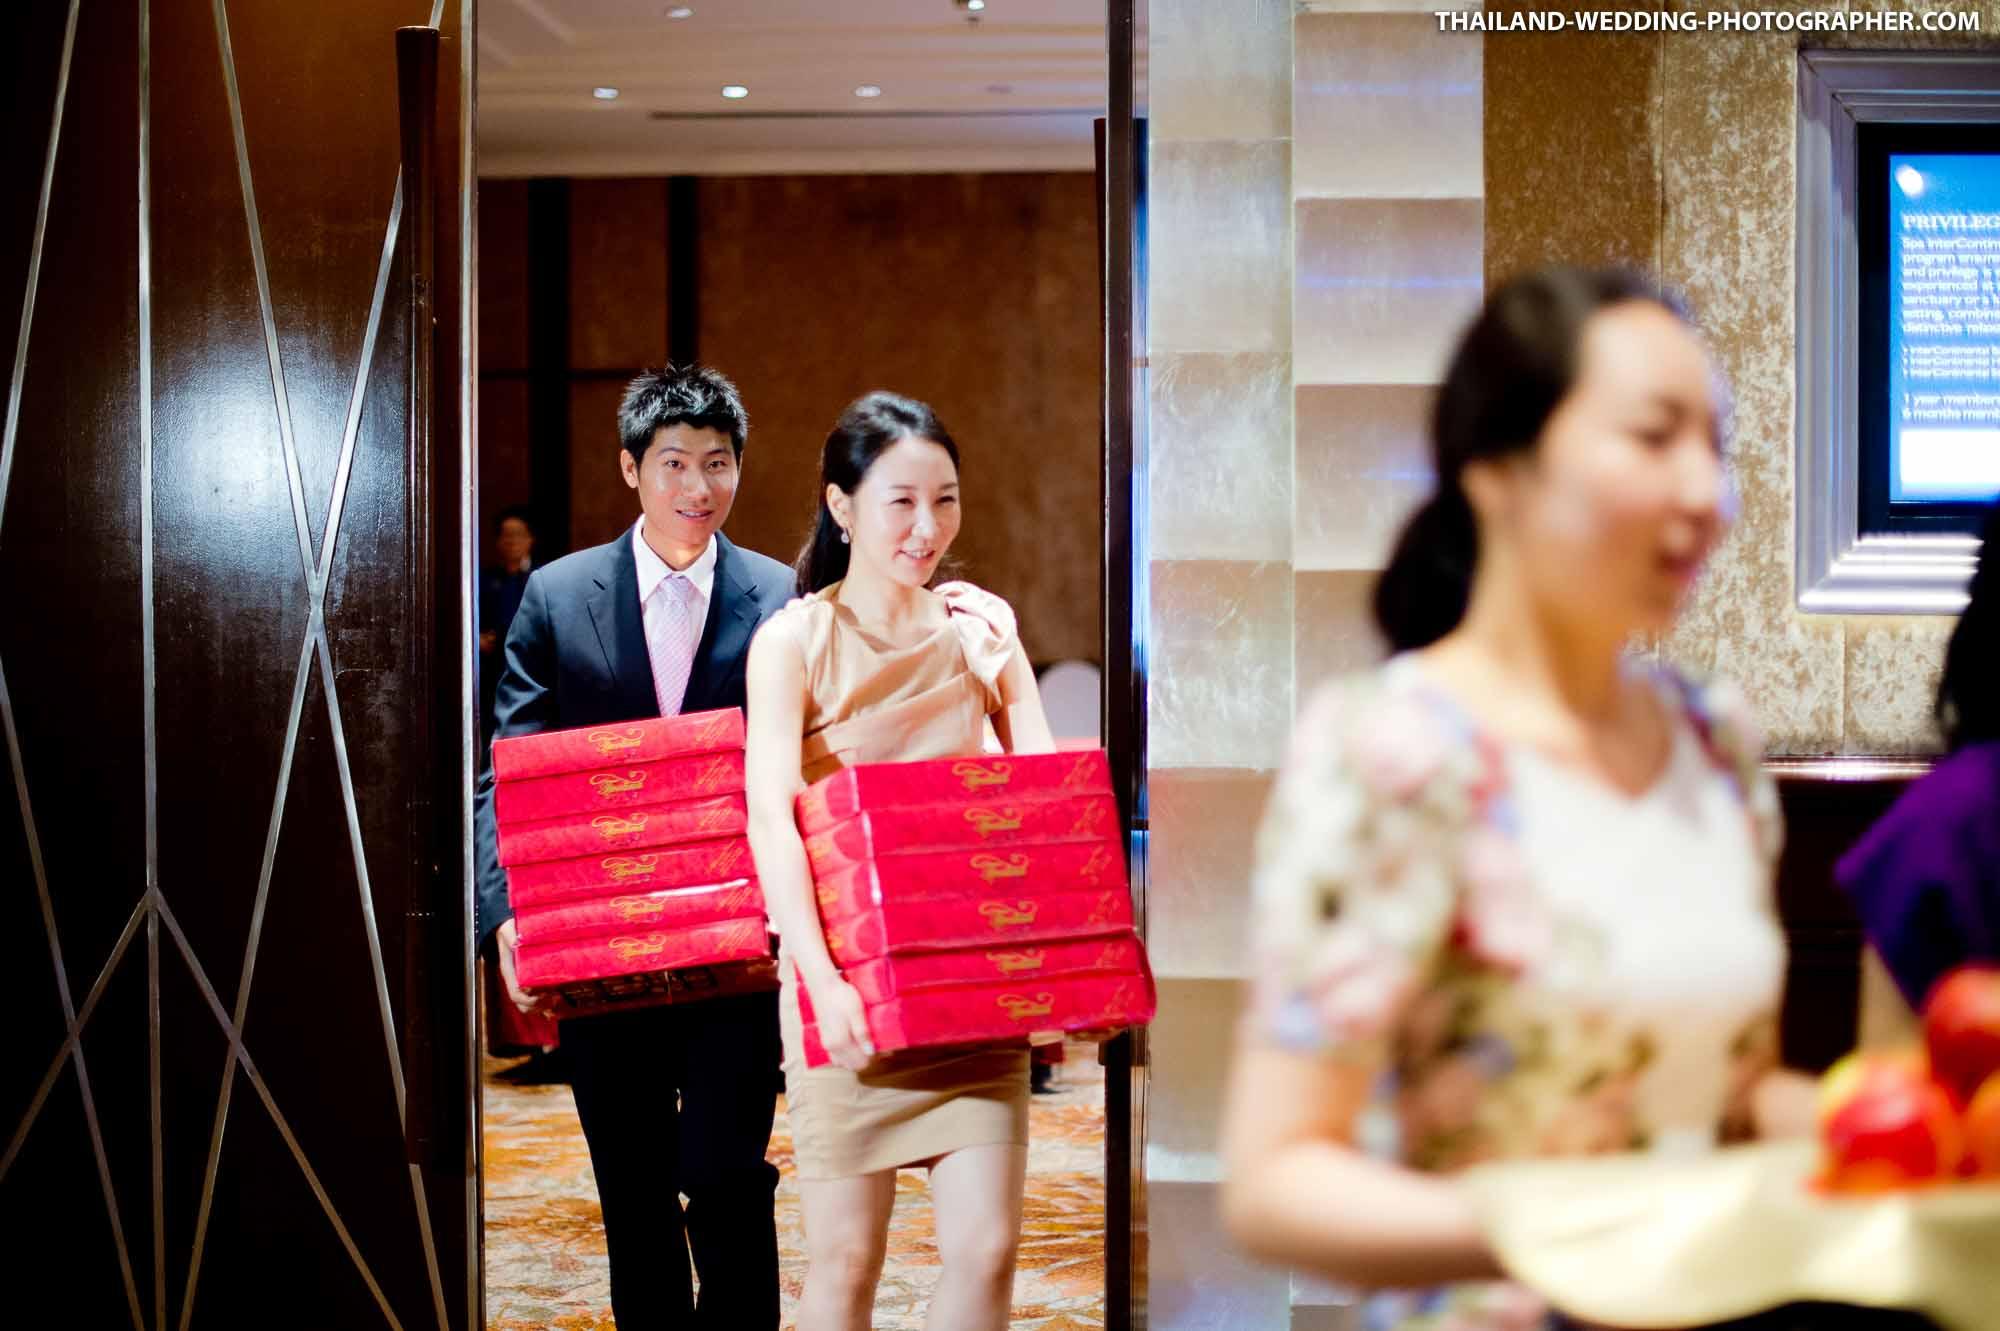 InterContinental Bangkok Thailand Wedding Photography